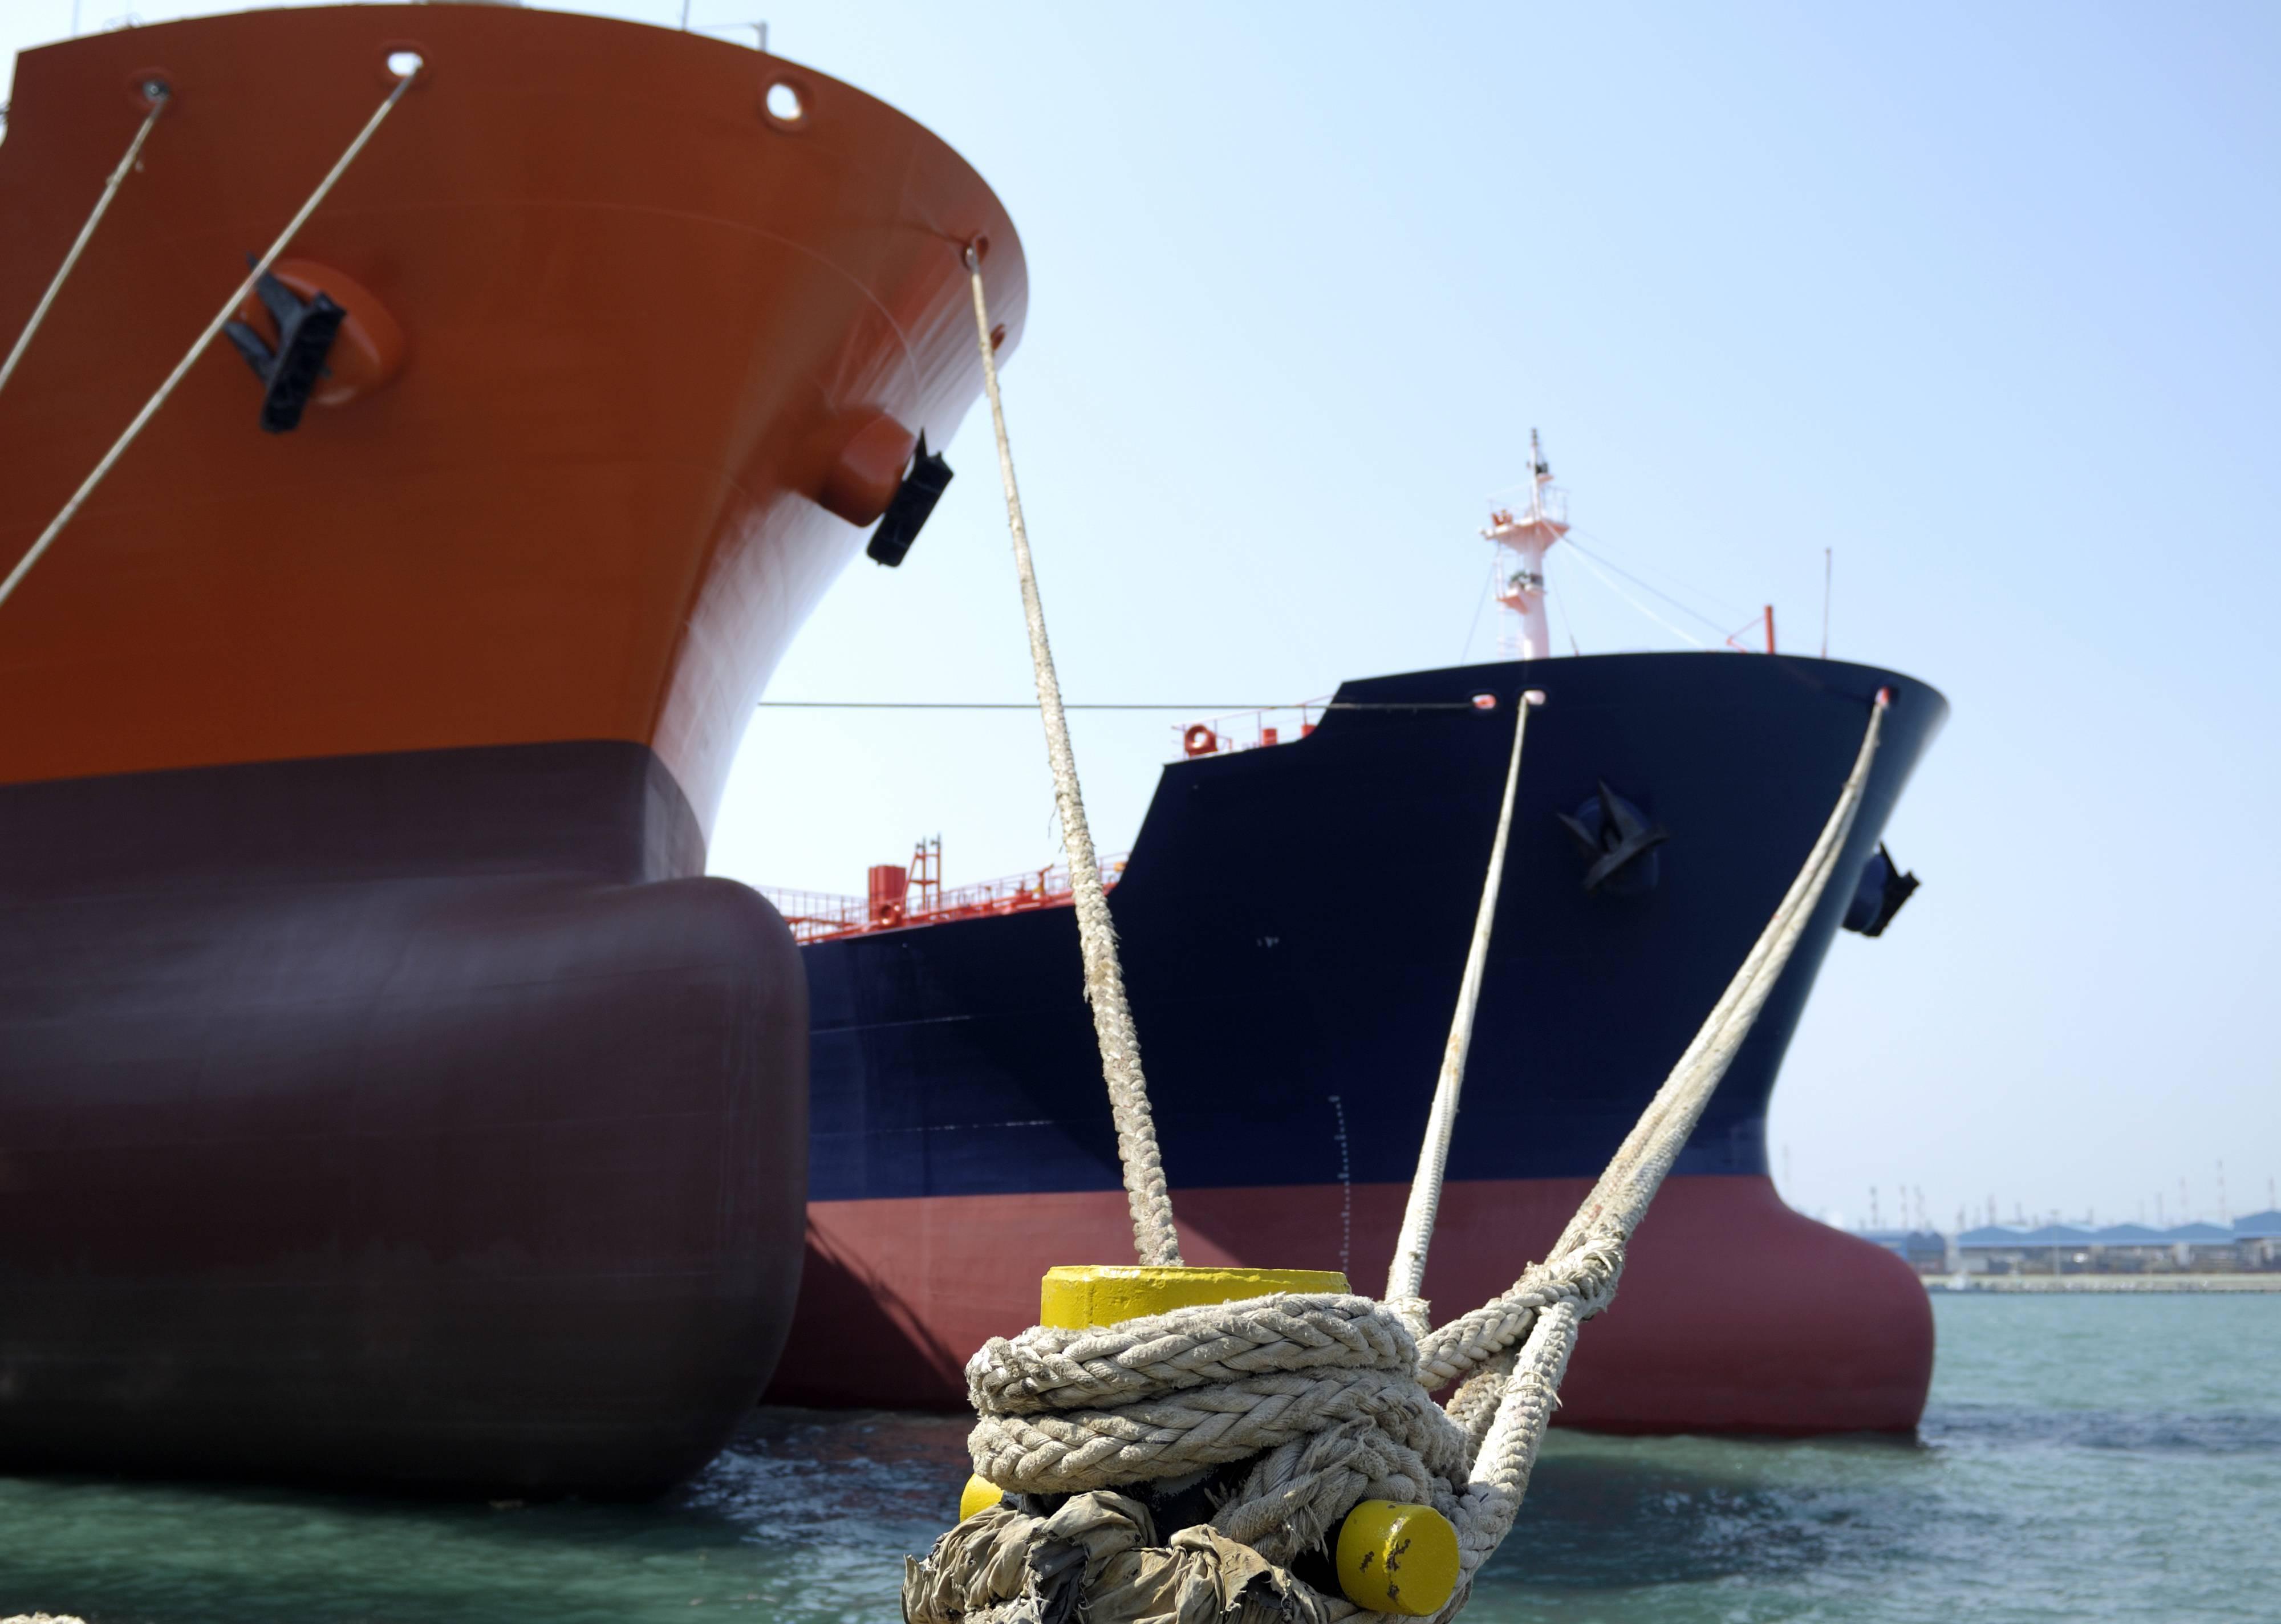 WTI Crude Price 'Will Struggle' to Stay Above $75